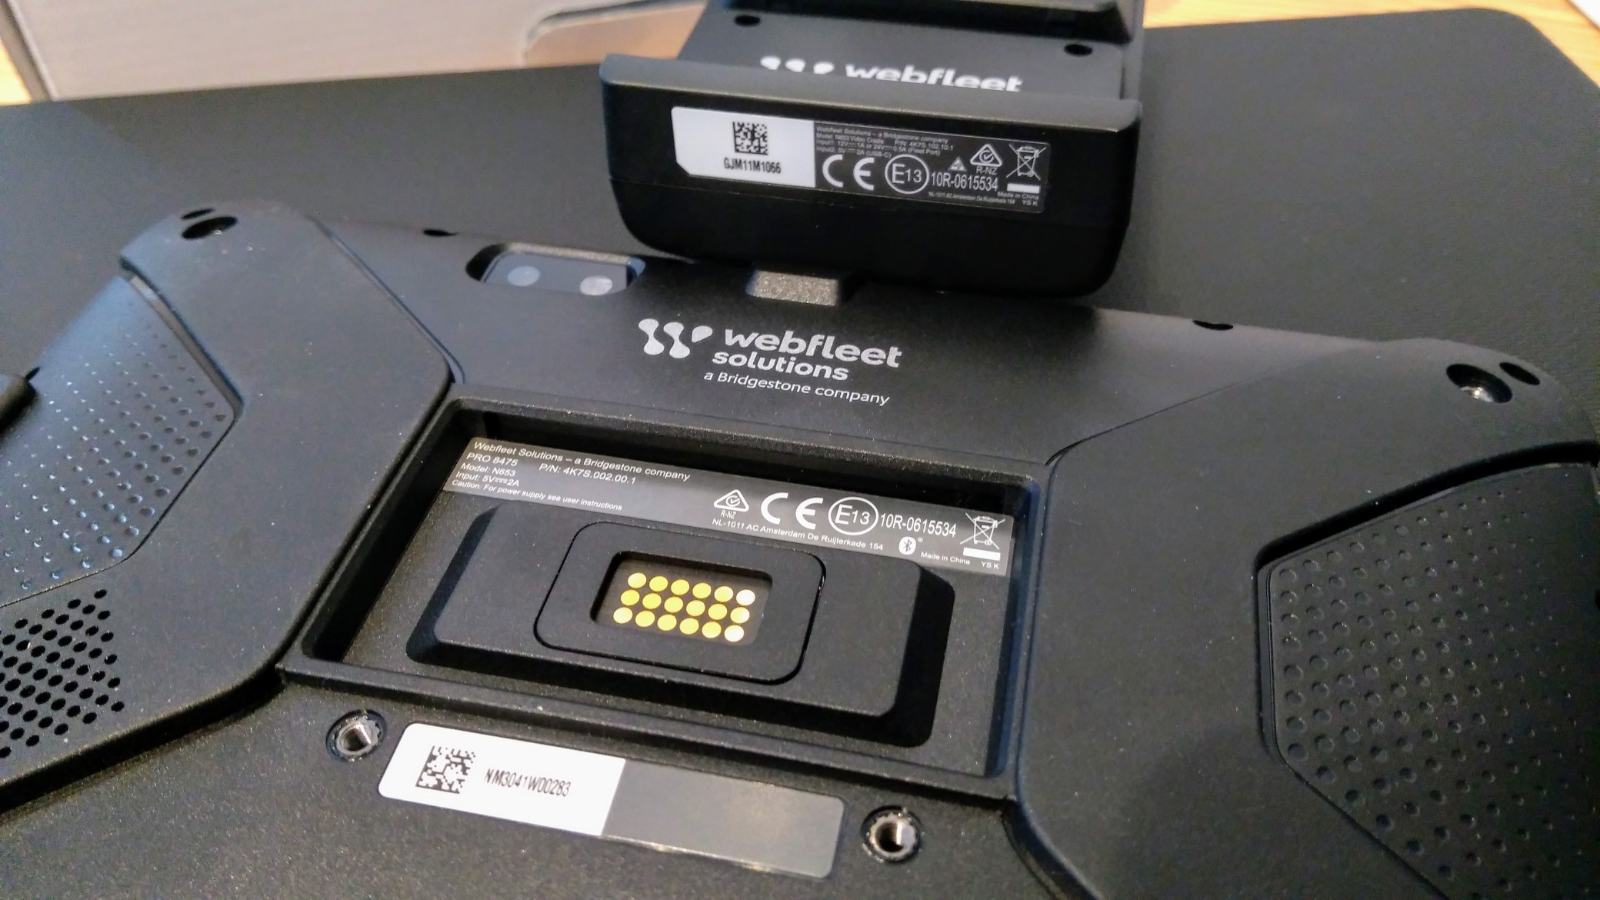 WebFleet Solutions PRO 8475 TRUCK